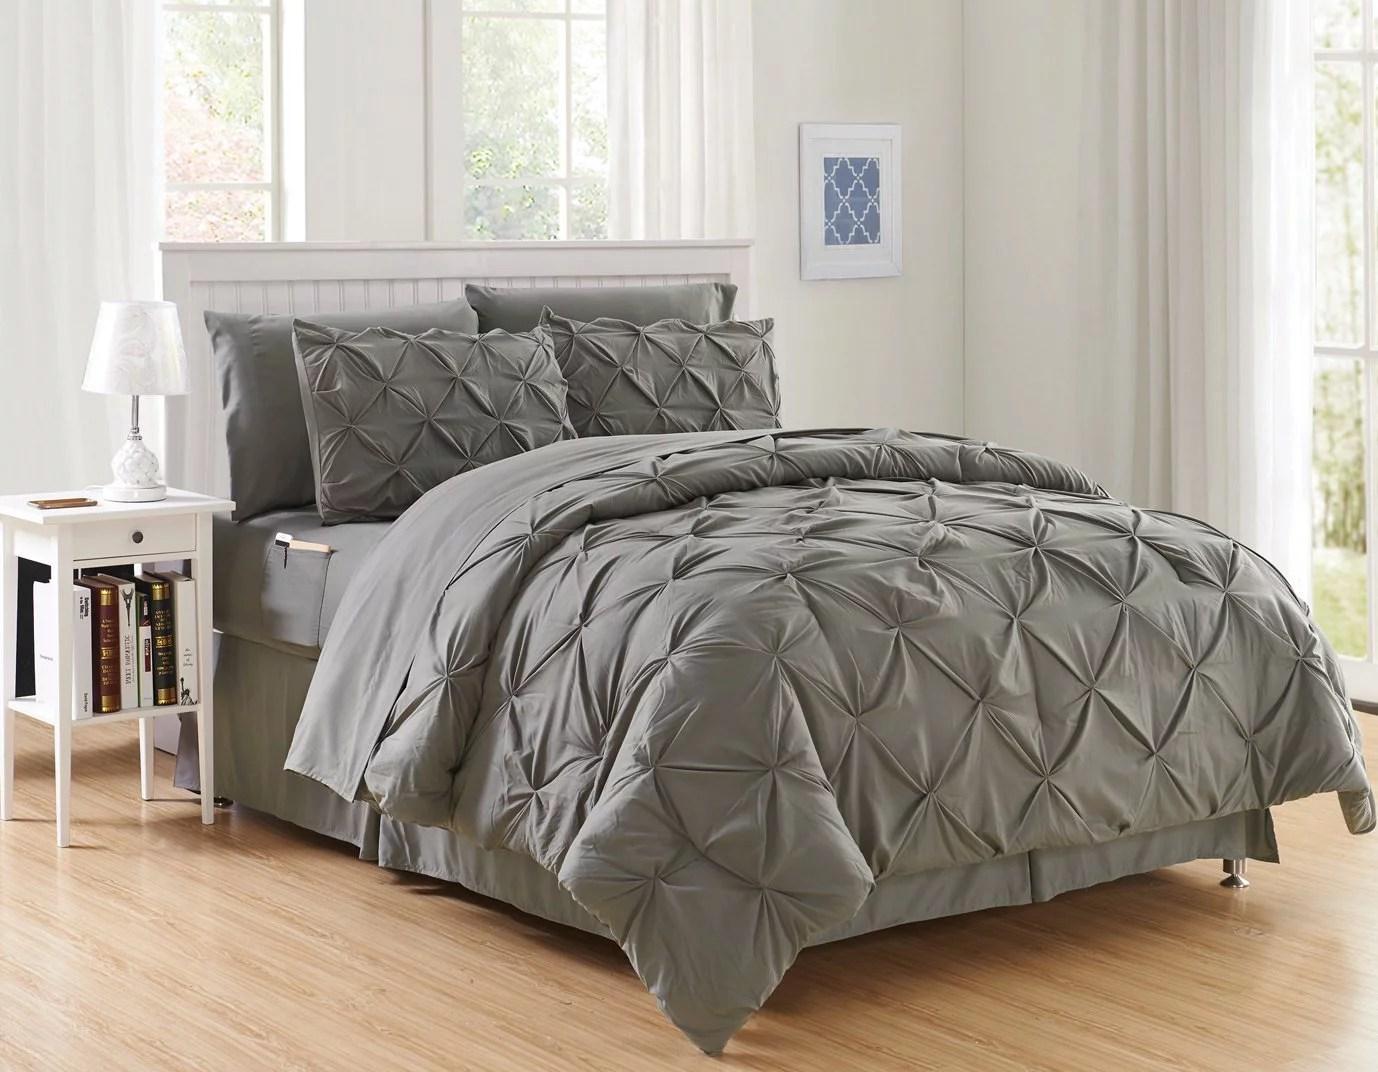 cottonight gray comforter sets twin